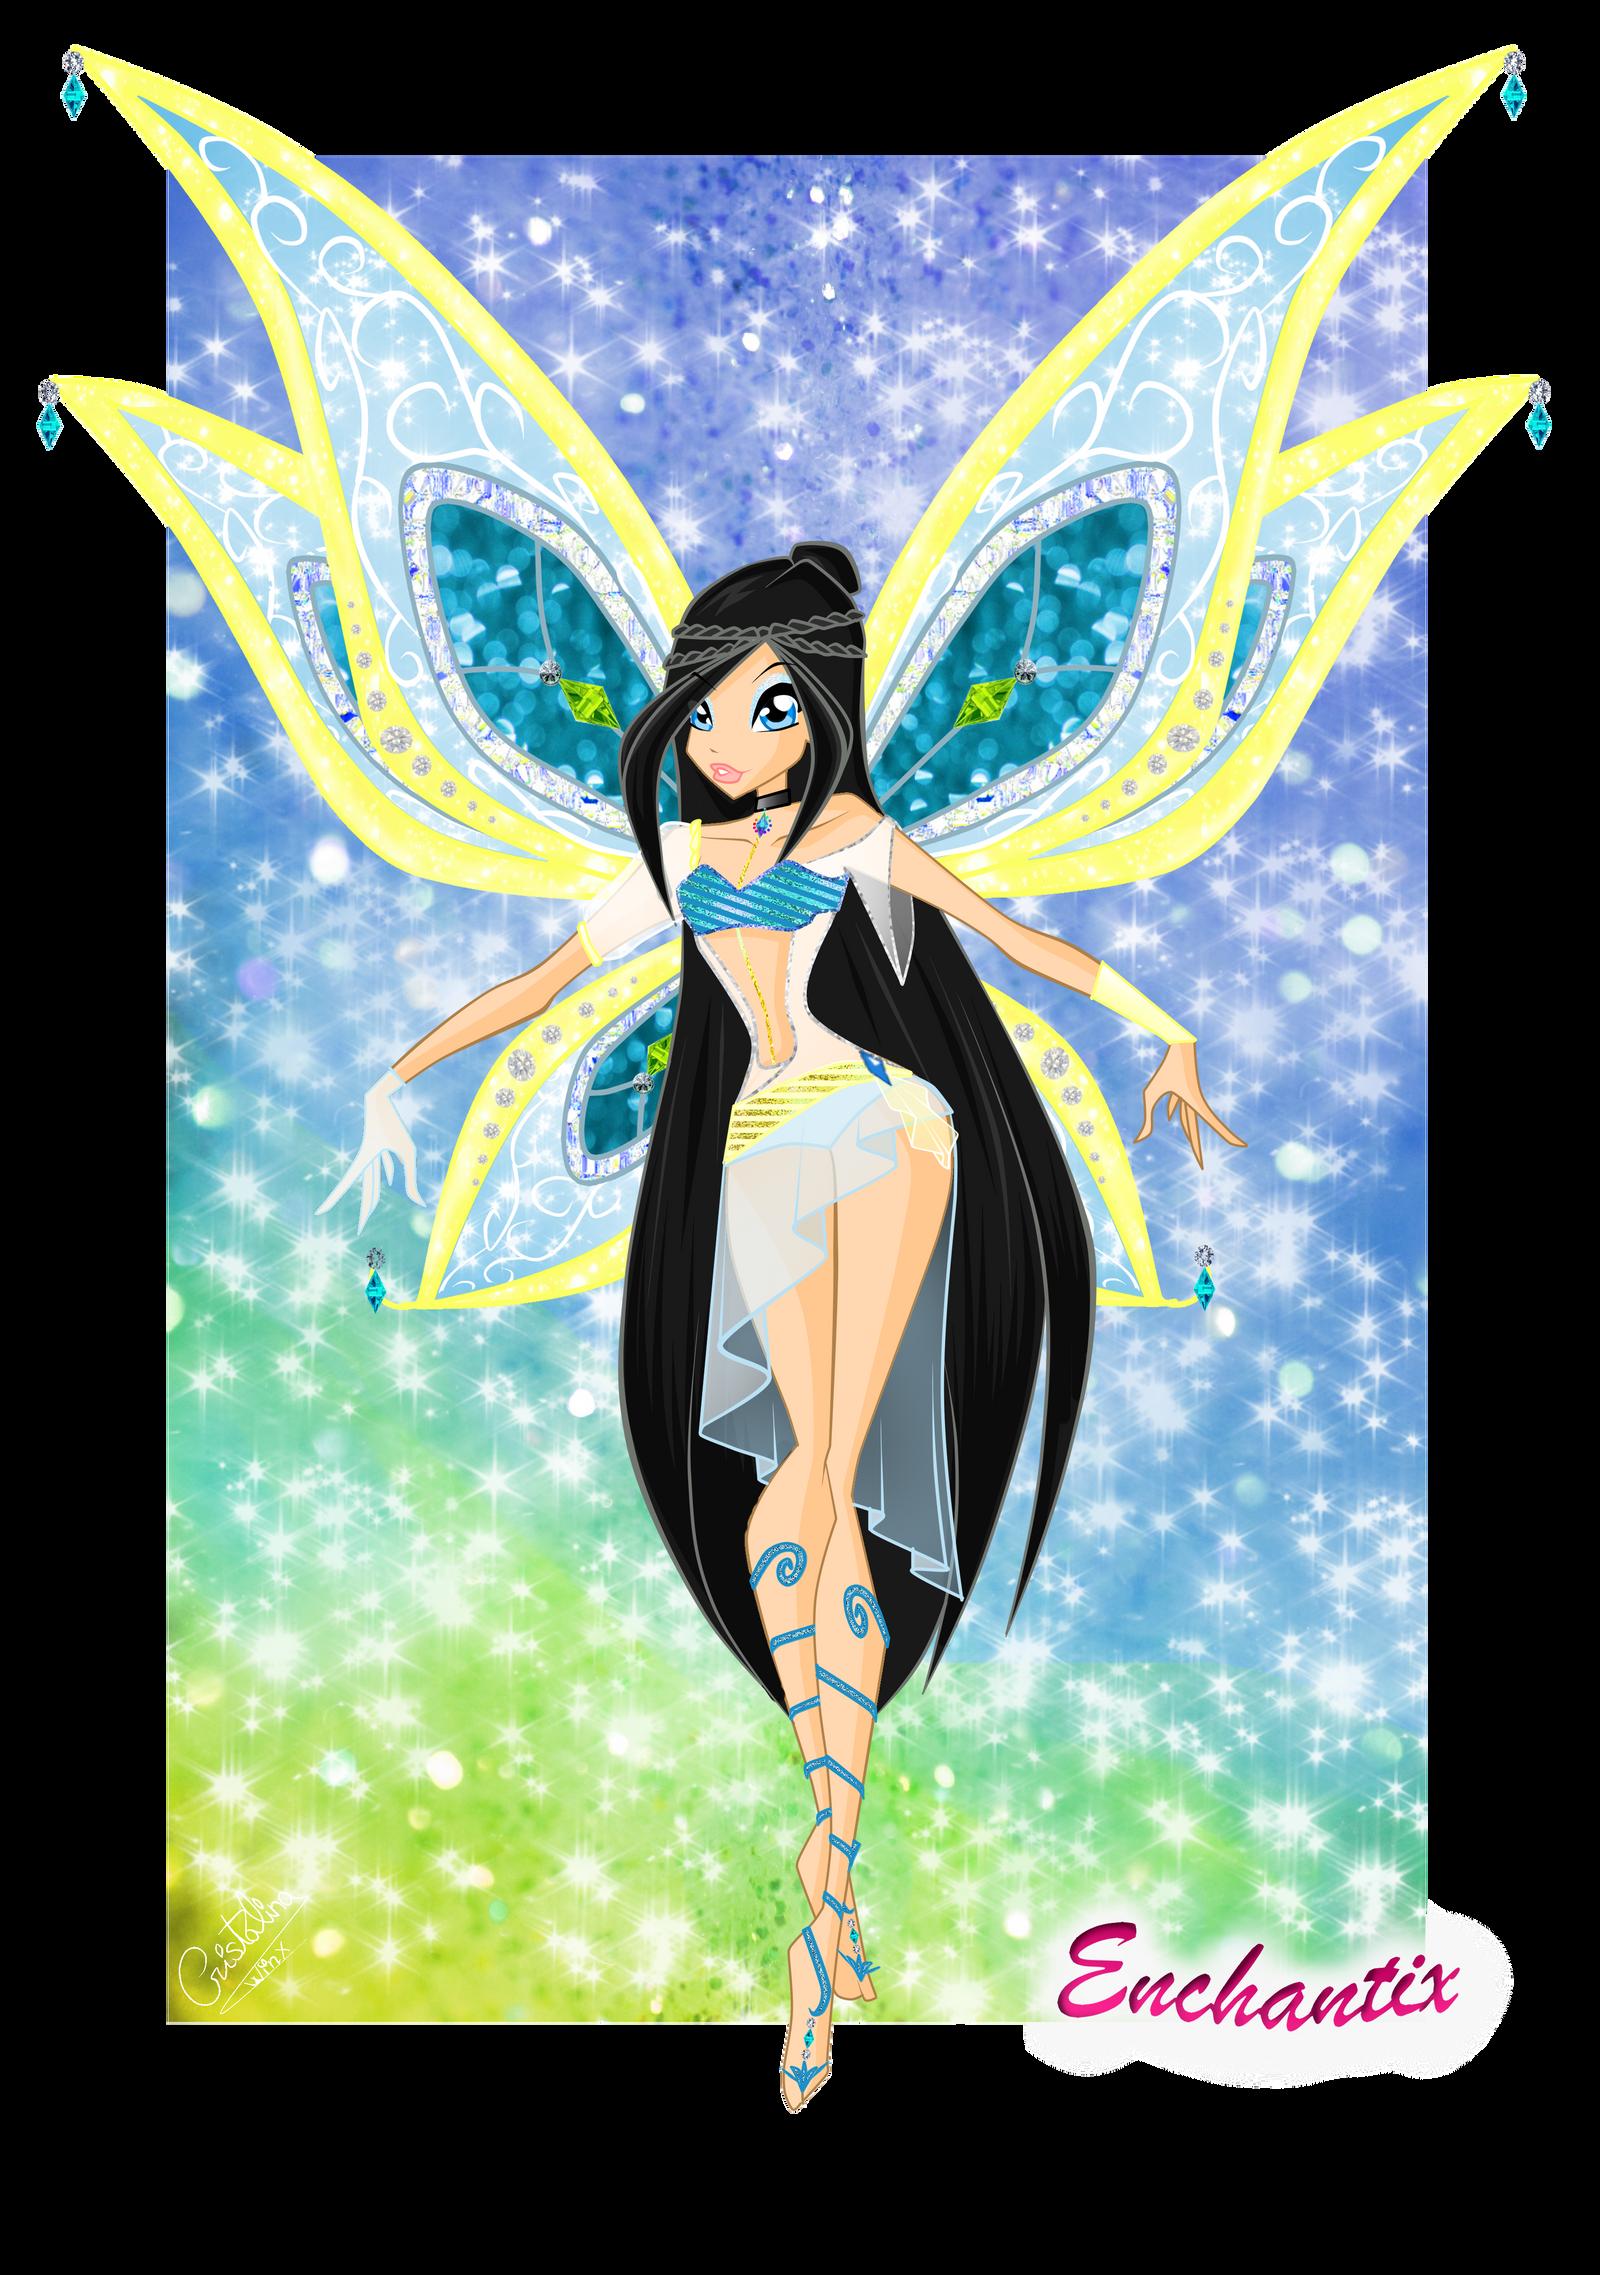 Cristalina Enchantix by Cristalinawinx